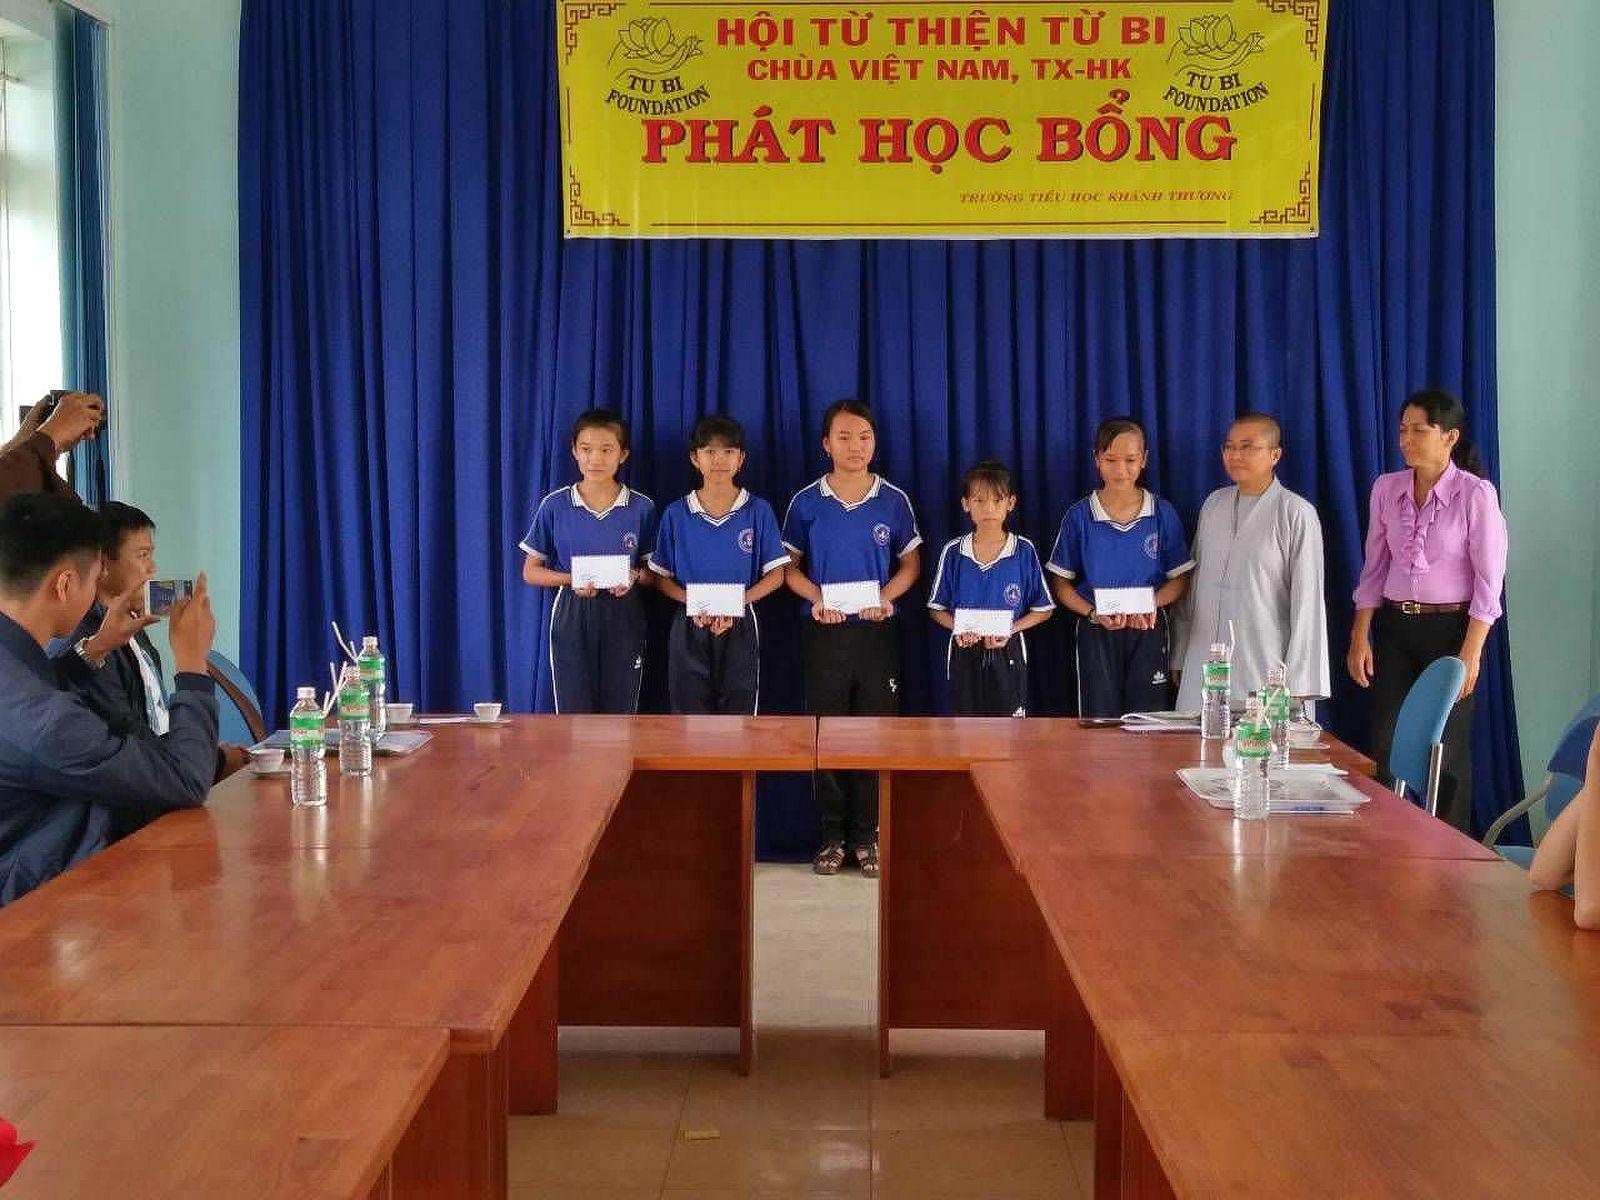 Phat Hoc Bong (04)